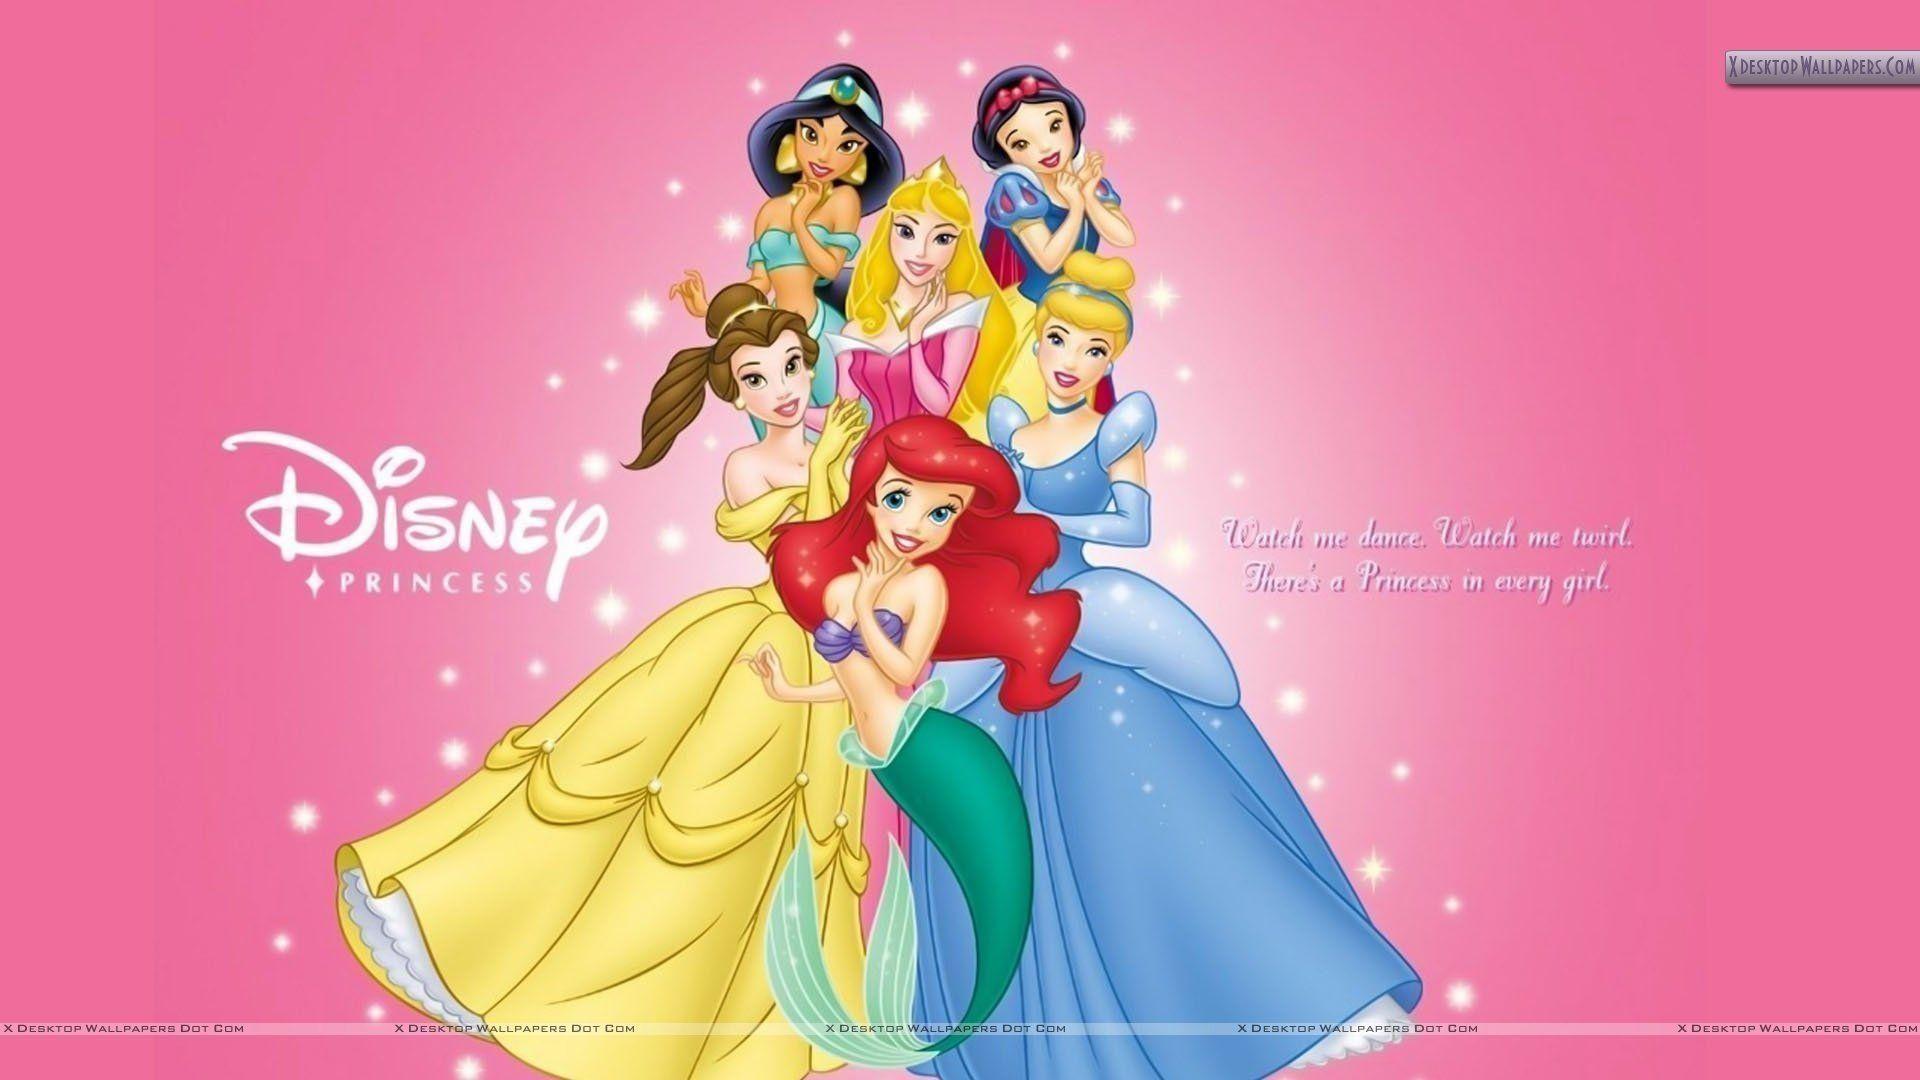 New Princess Wallpaper 56 Images